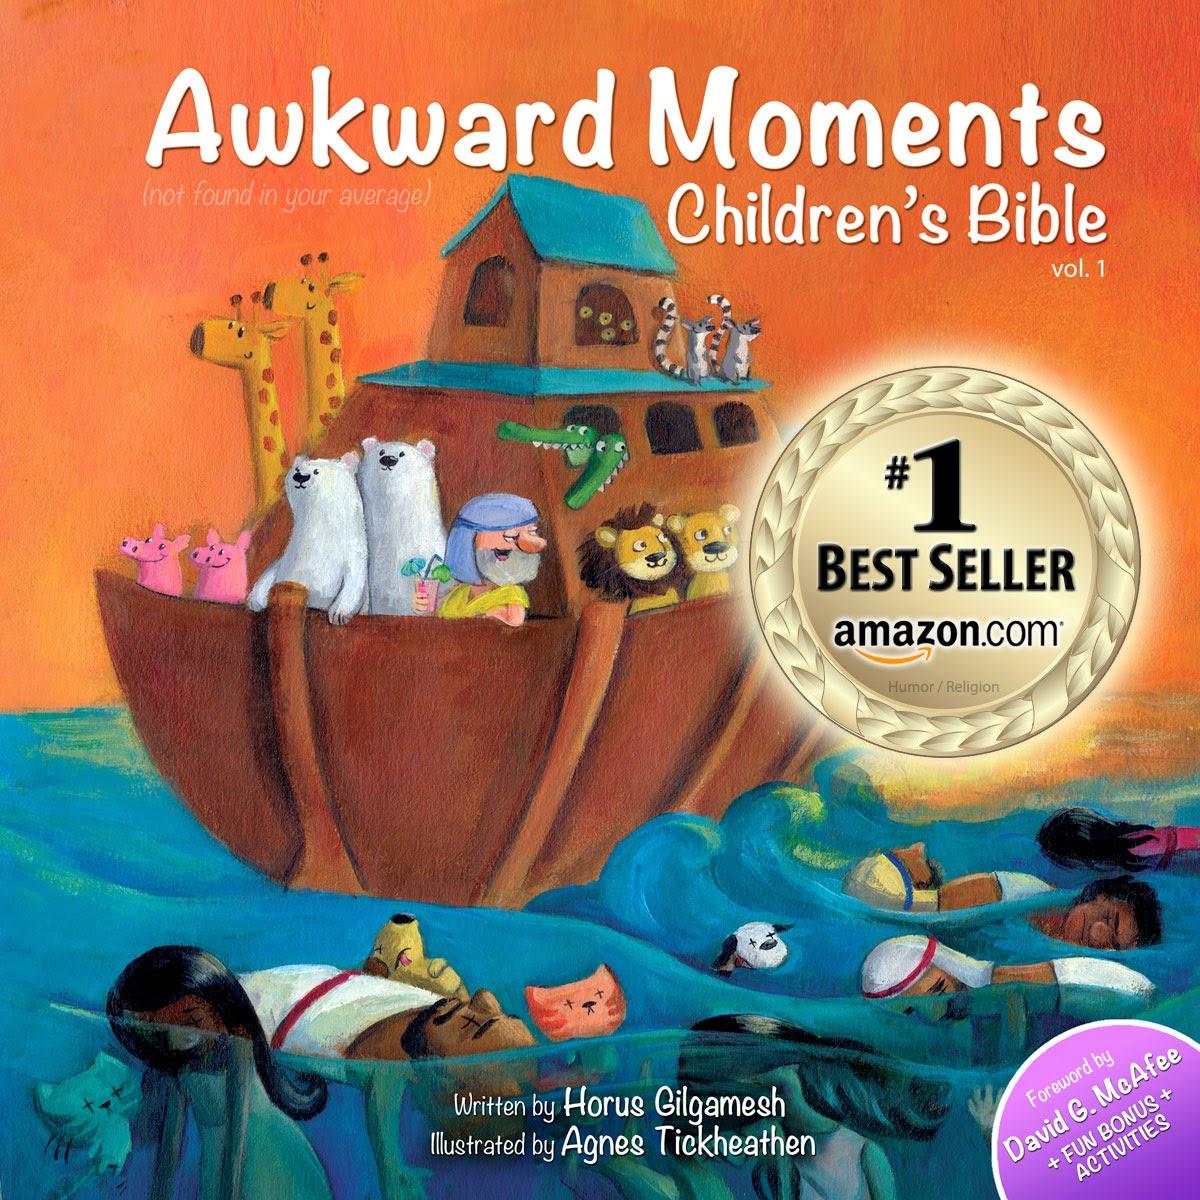 funny children's bible joke book - awkward moments